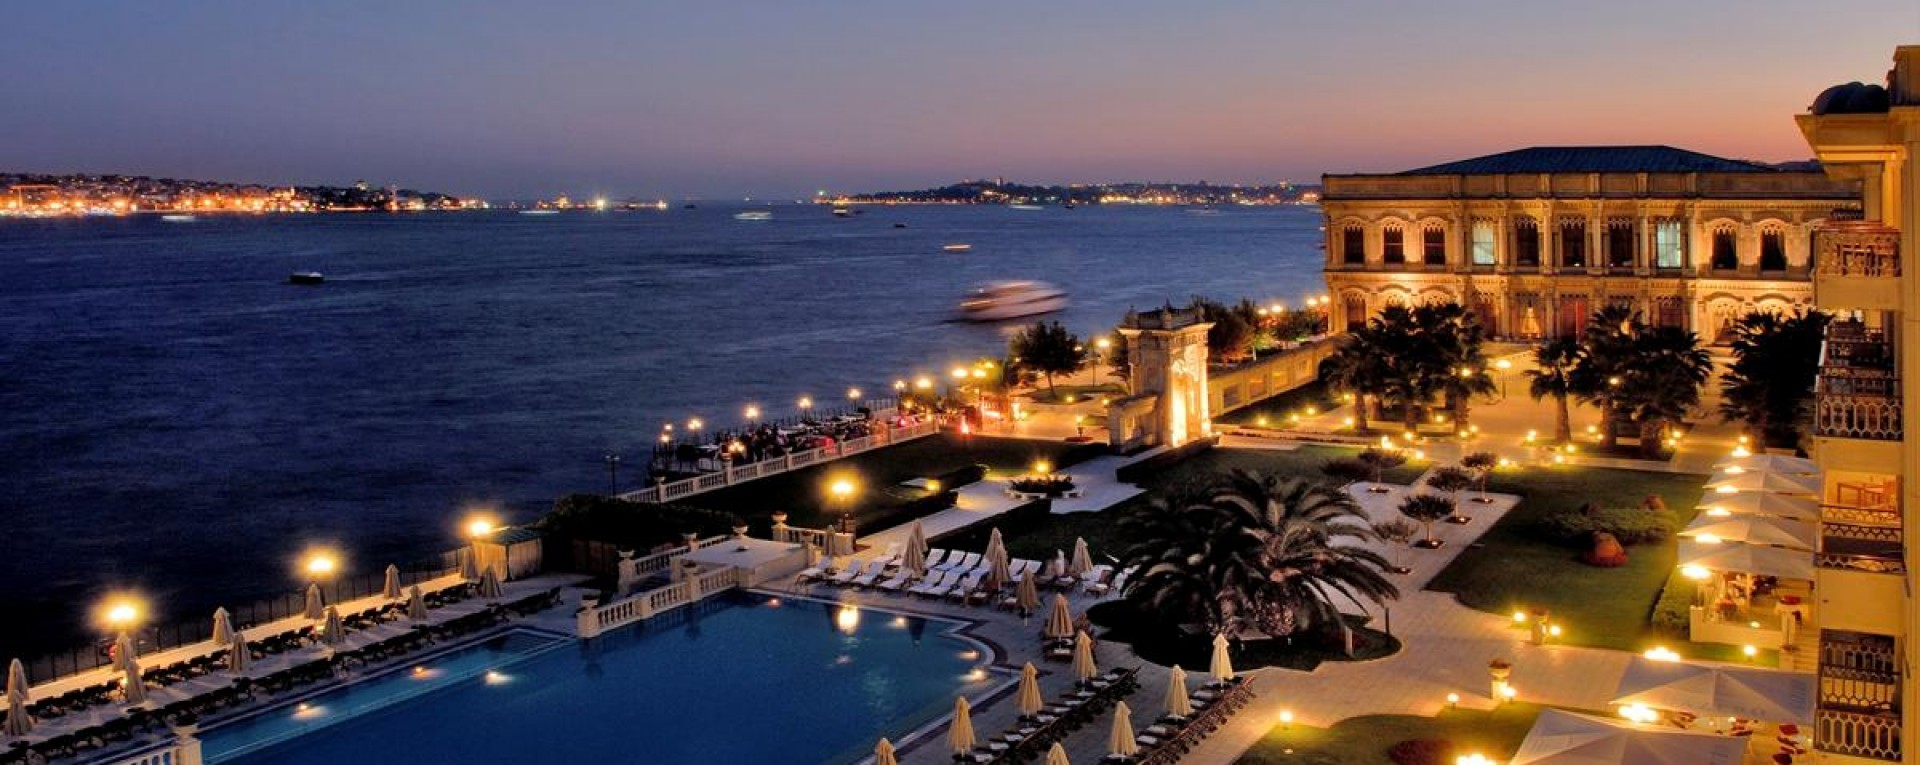 ciragan palace kempinski hotel istanbul turkey europe On luxury short breaks europe